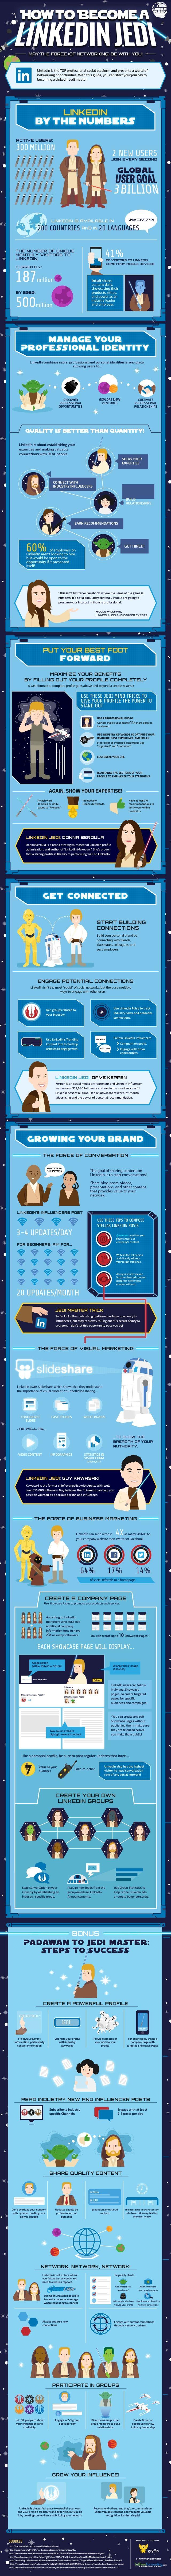 How to become a #Linkedin #Jedi [#infographic] #SocialMedia